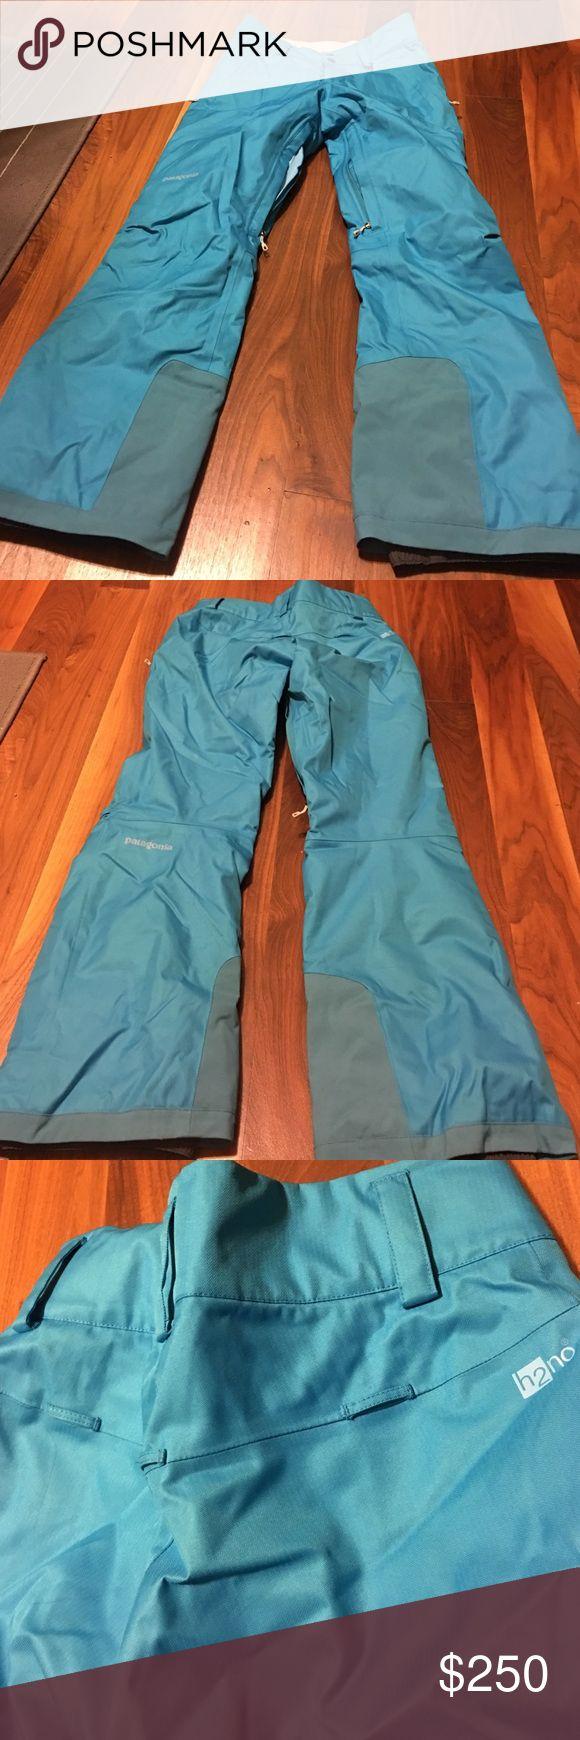 Patagonia Ski Pants New Ski Pants XS Patagonia Other